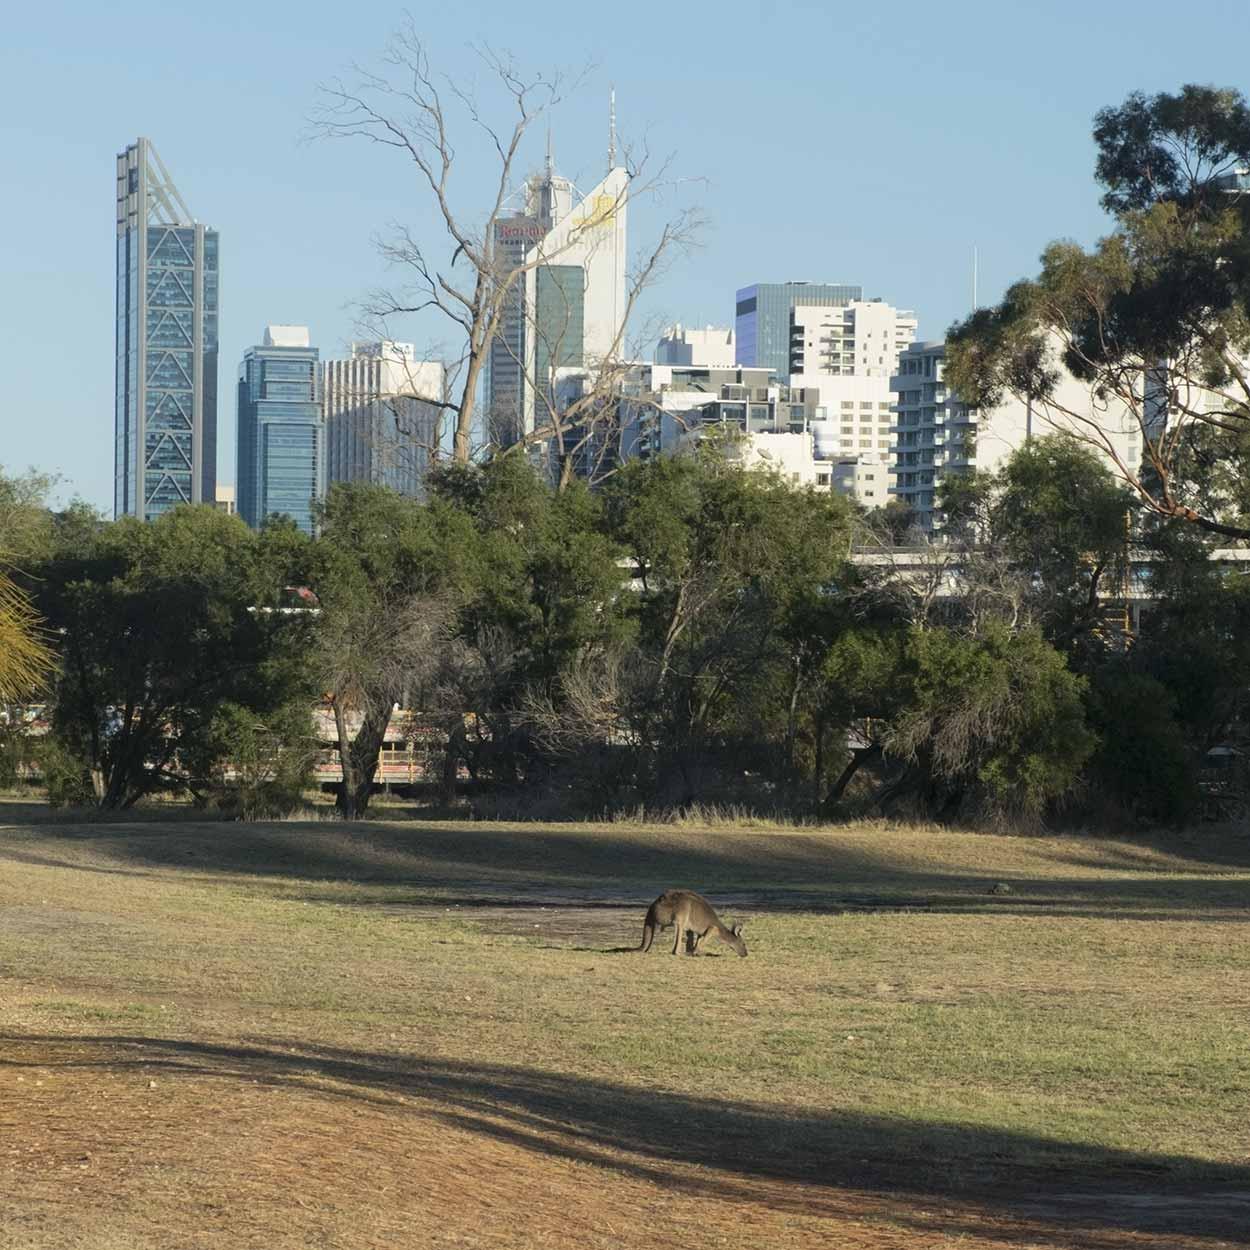 Kangaroo on Heirisson Island, Perth, Western Australia